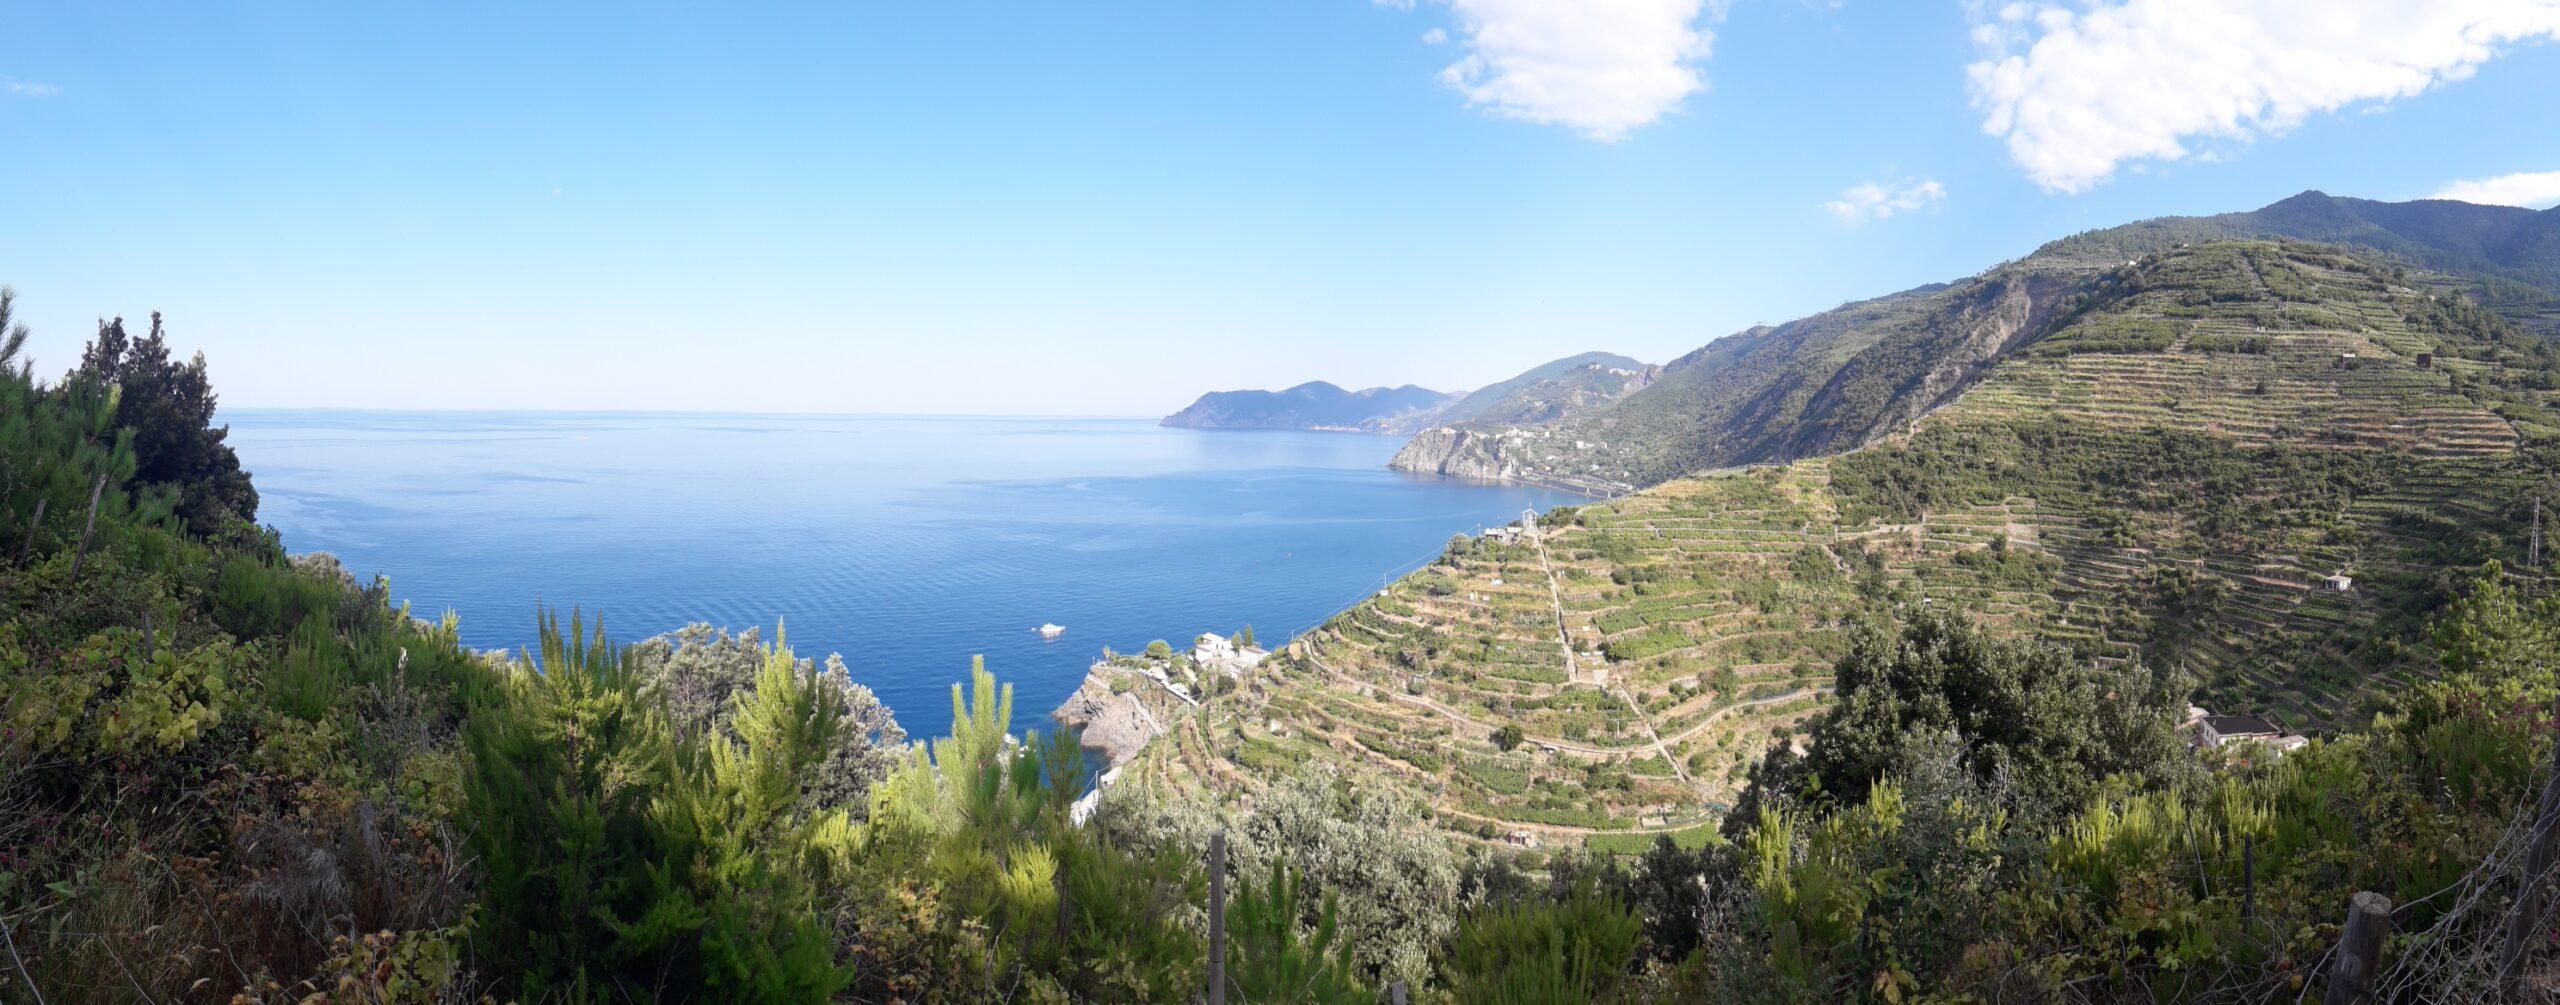 Cinque Terre off the beaten track